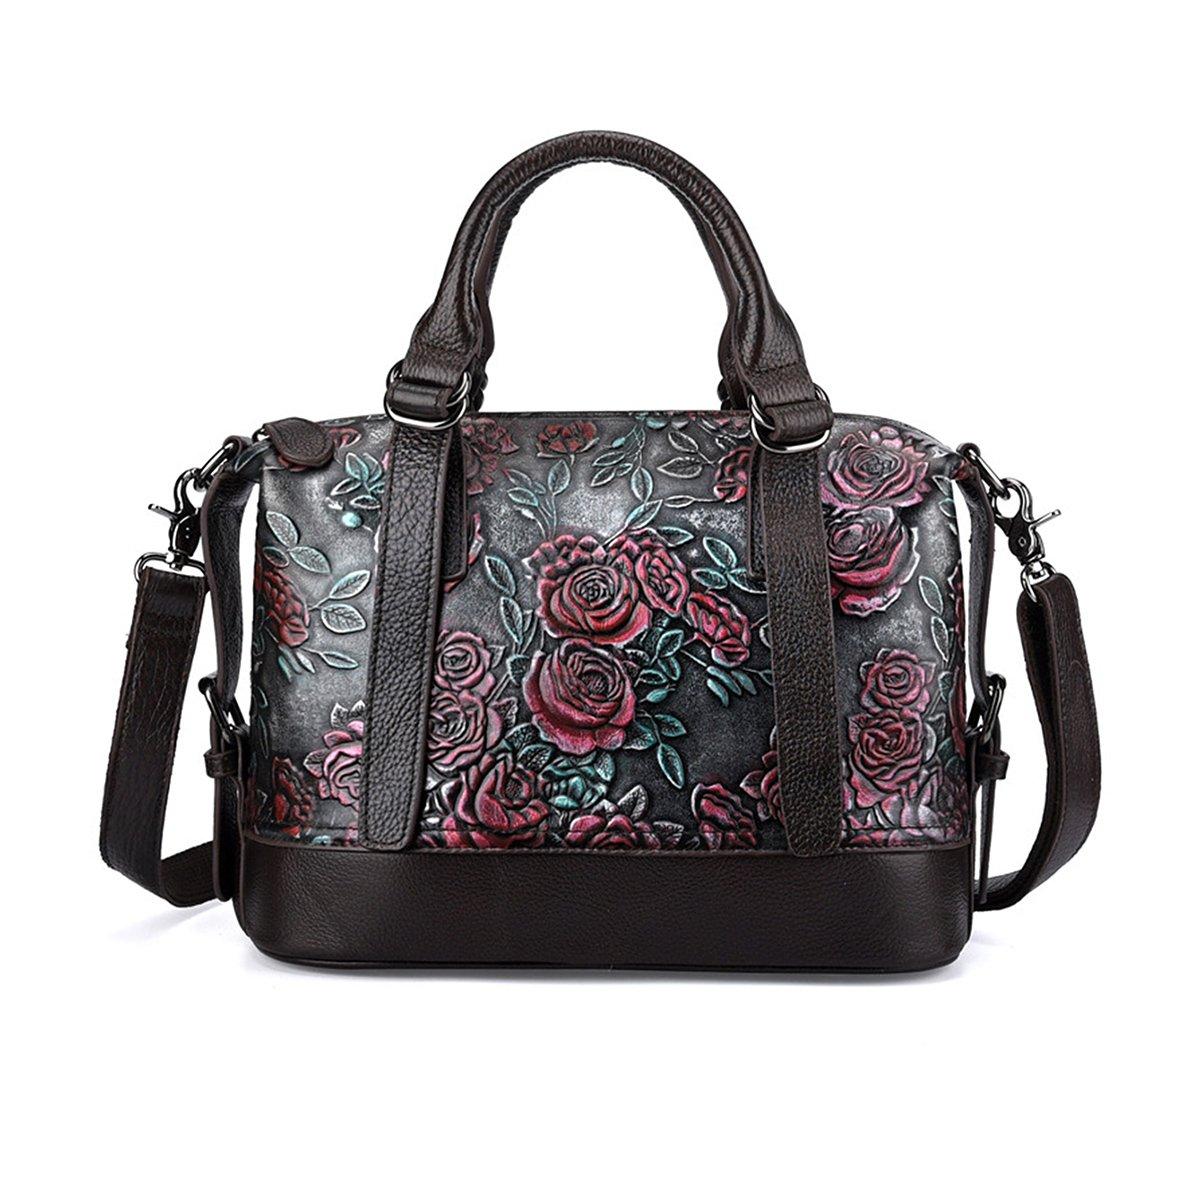 Crossbody Bag for Women Vintage Rose Top Handle Tote Purses Genuine Leather Satchels Handbag (silver)